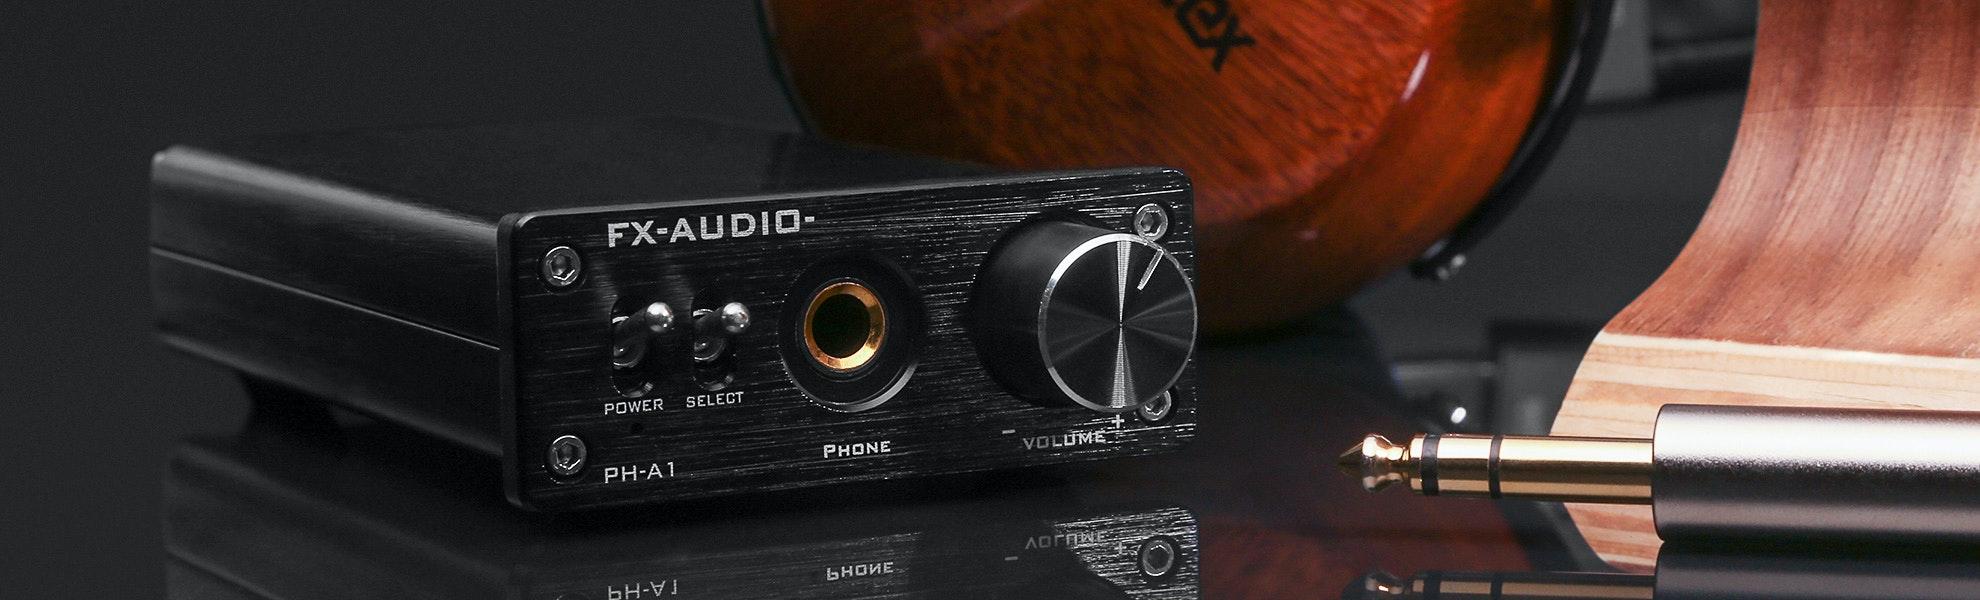 FX Audio PH-A1 Headphone Amp